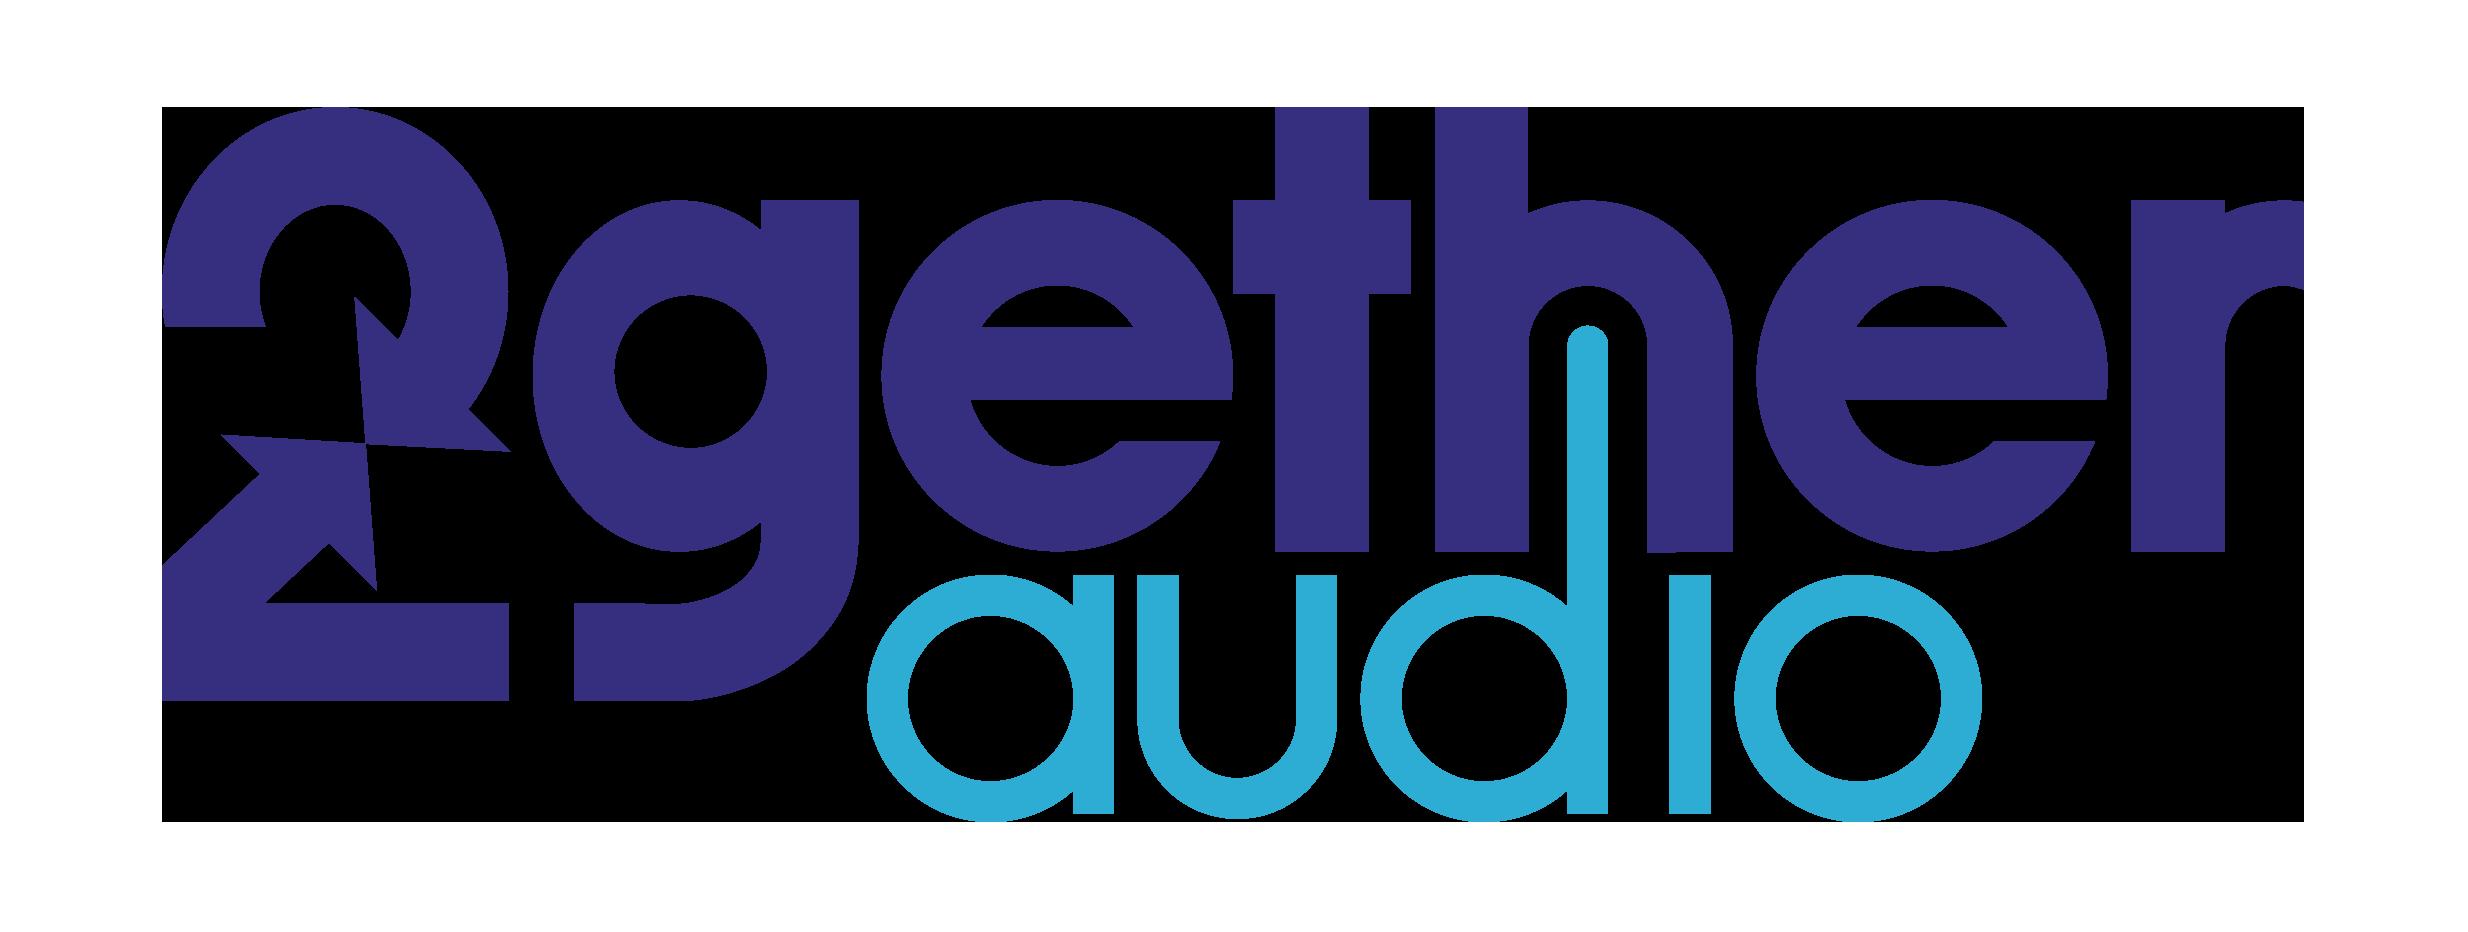 2getheraudio logo. Large.